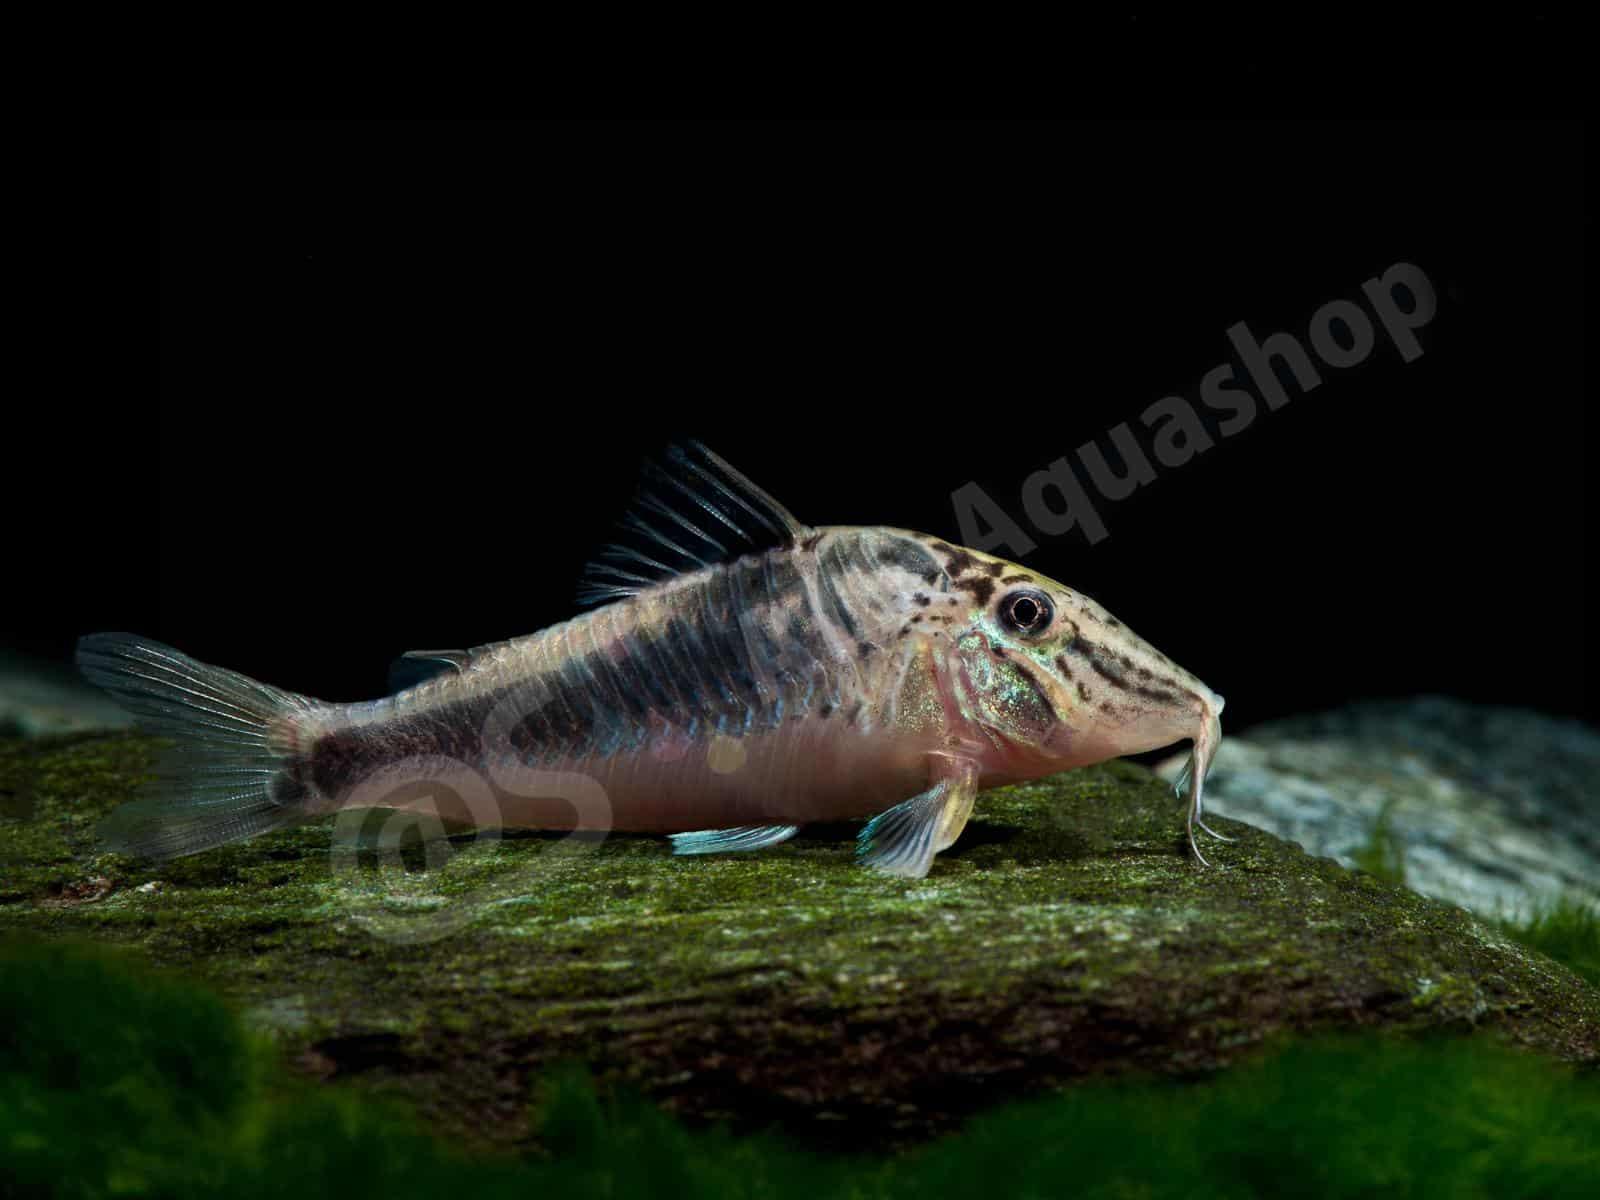 corydoras semiaquilus enrico richter 0145 8